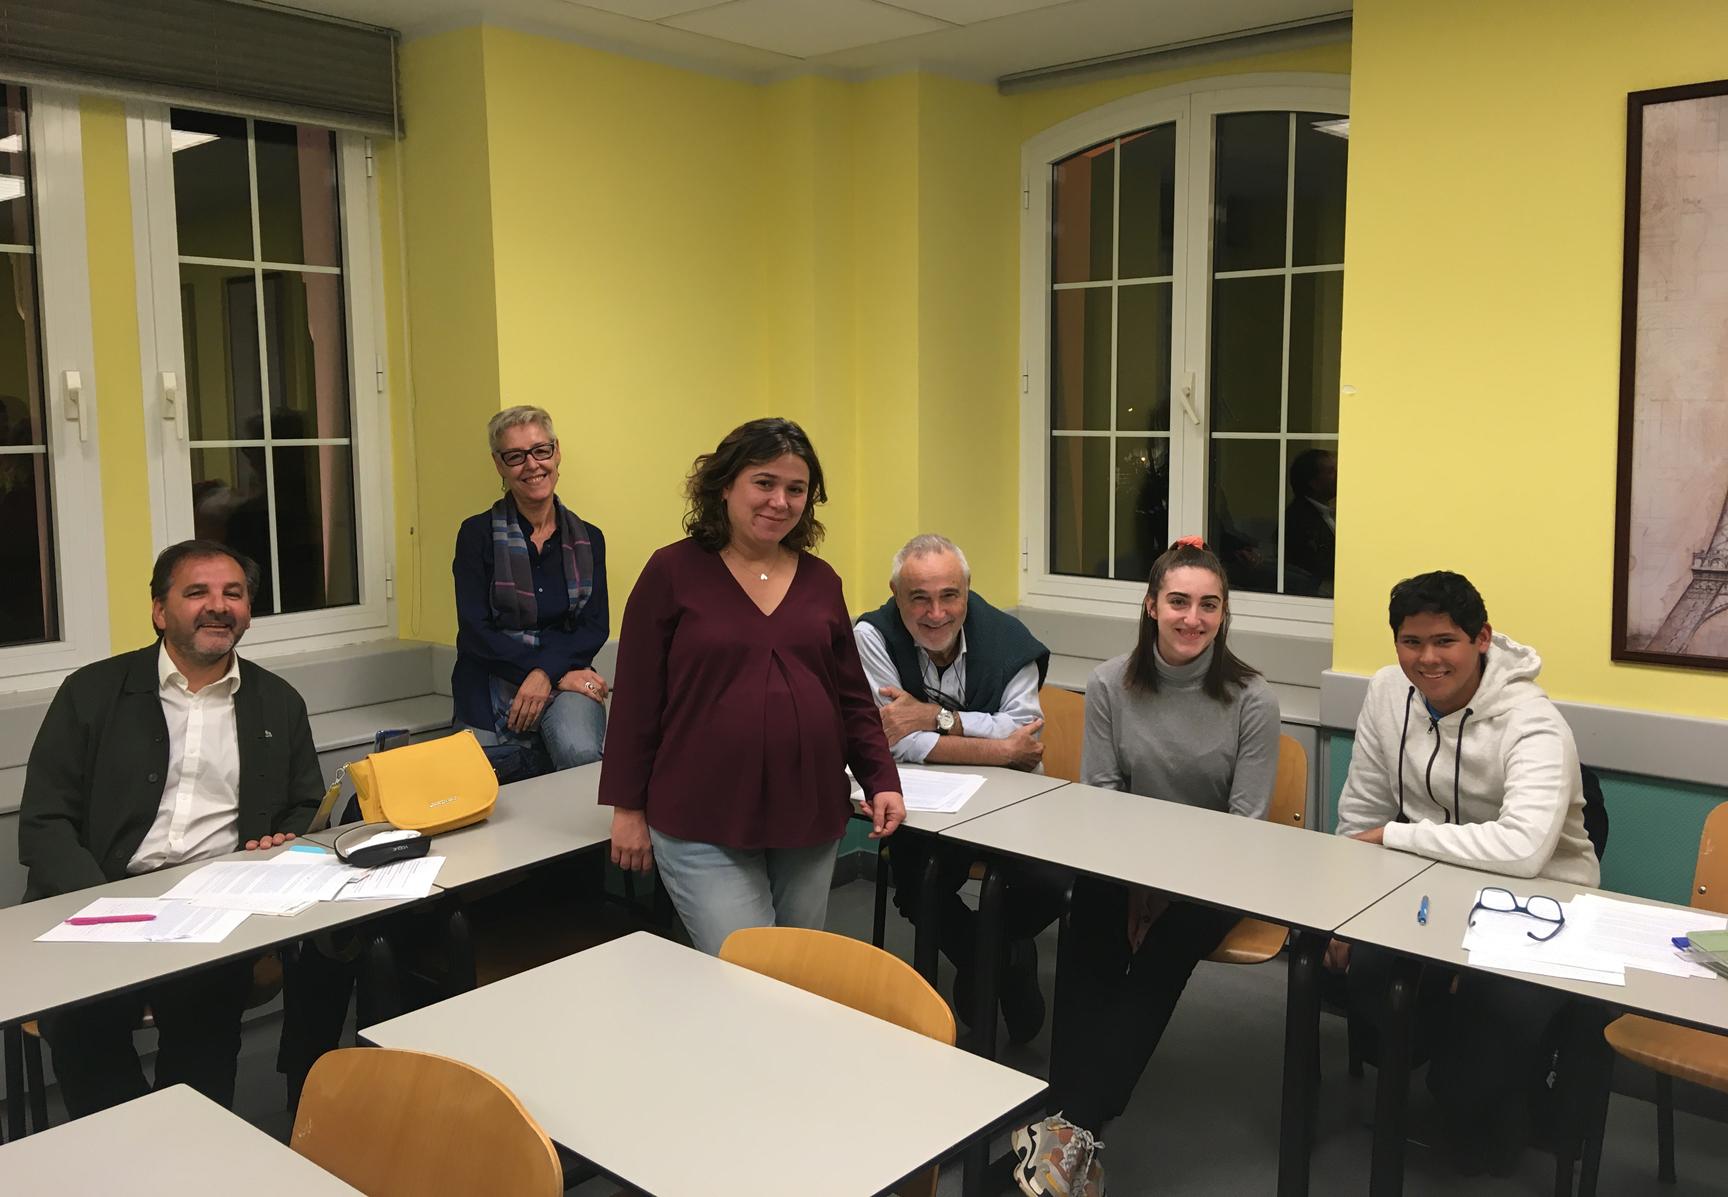 Curso de escritura creativa en el centro cultural Ibercaja de Logroño